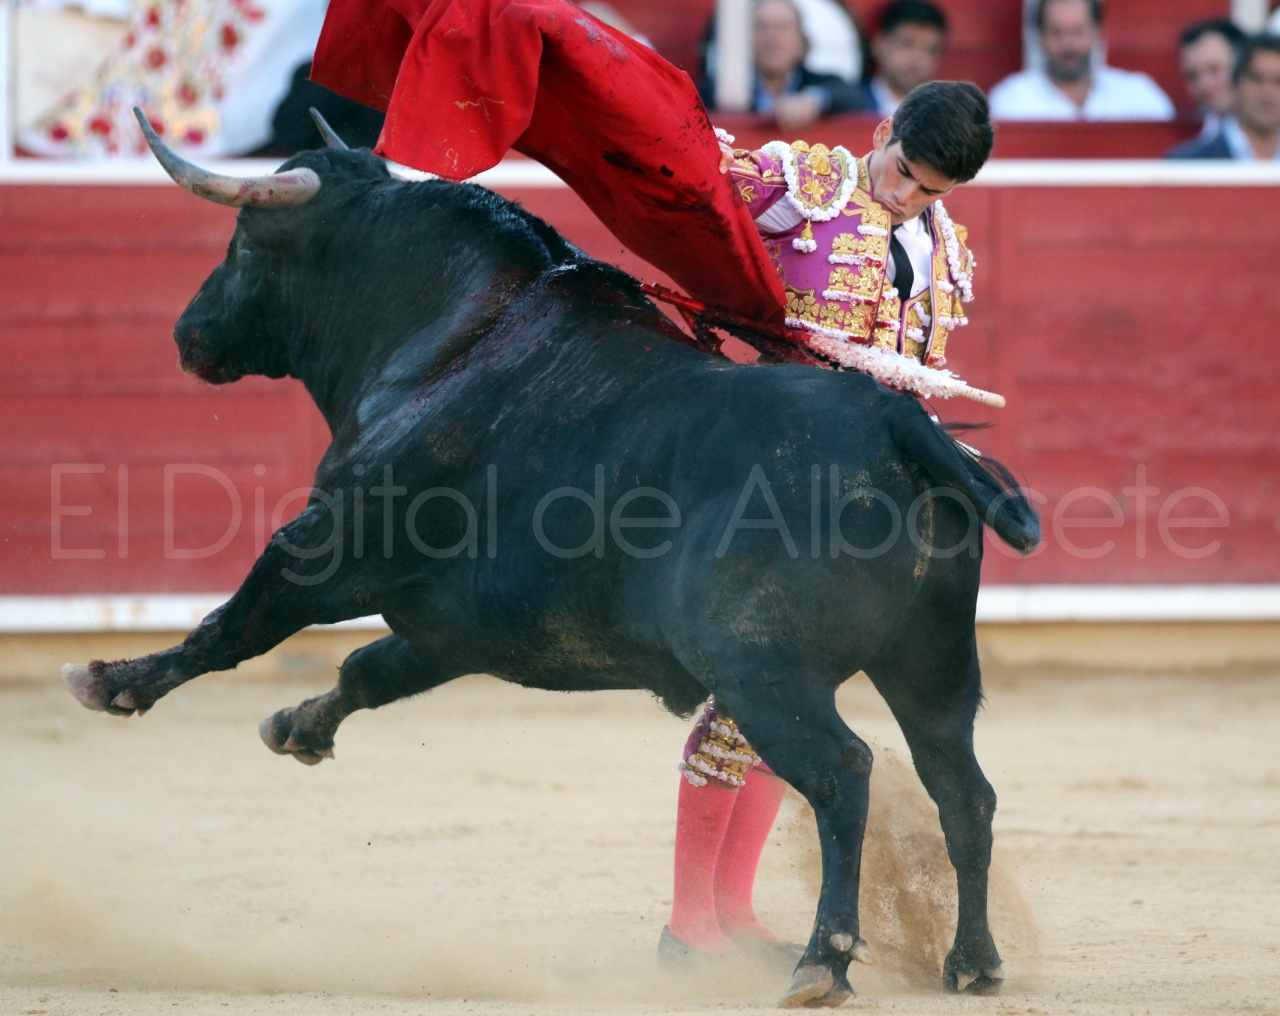 El Juli Lopez Simon y Garrido Feria Albacete 2015 toros  77